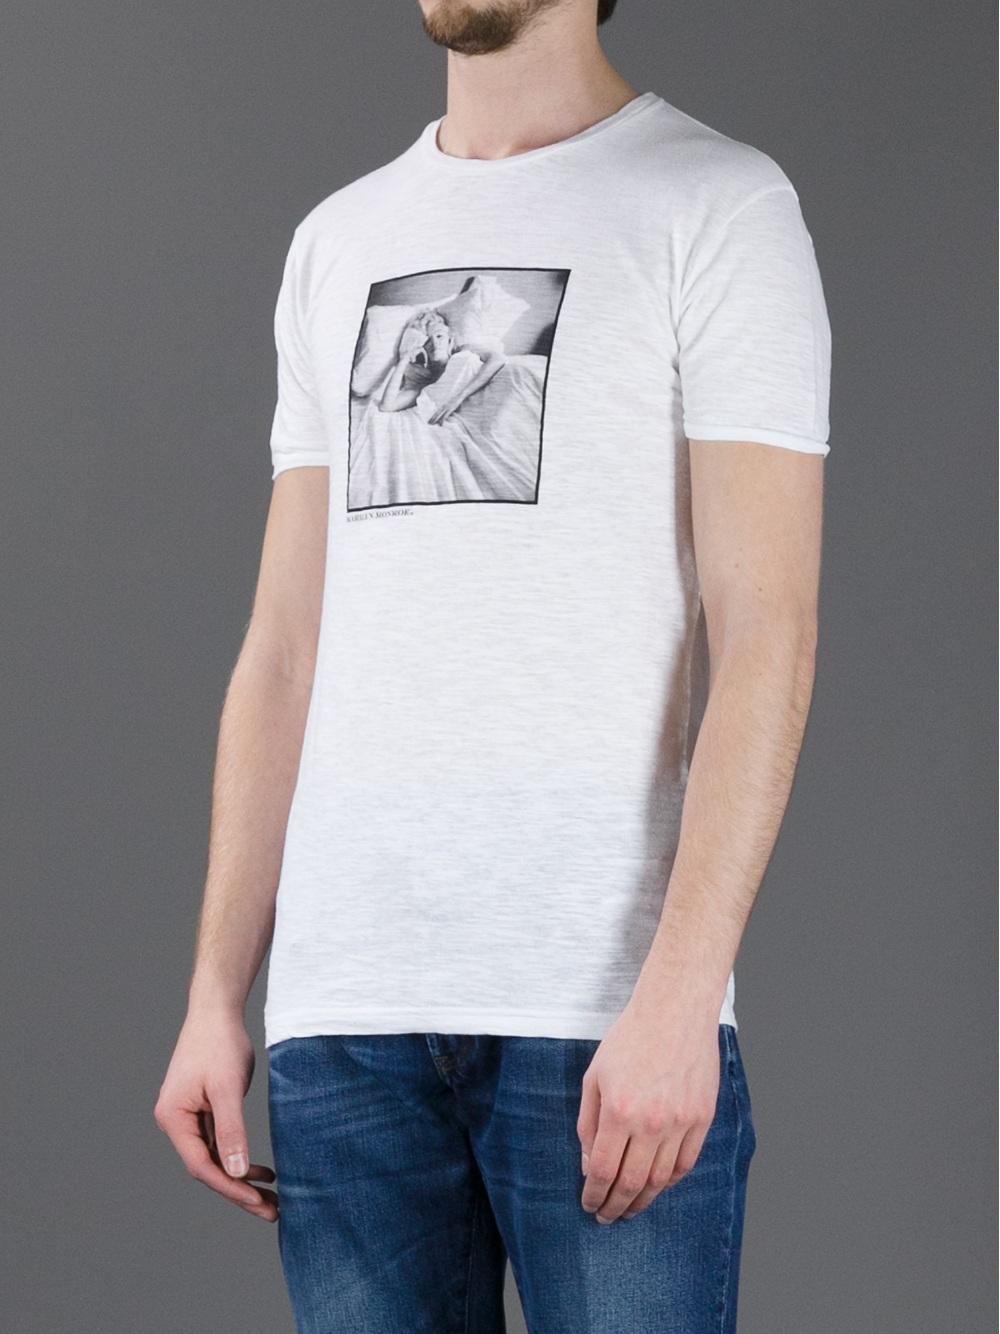 7a1902bd193 Lyst - Dolce   Gabbana Marilyn Monroe T-Shirt in White for Men